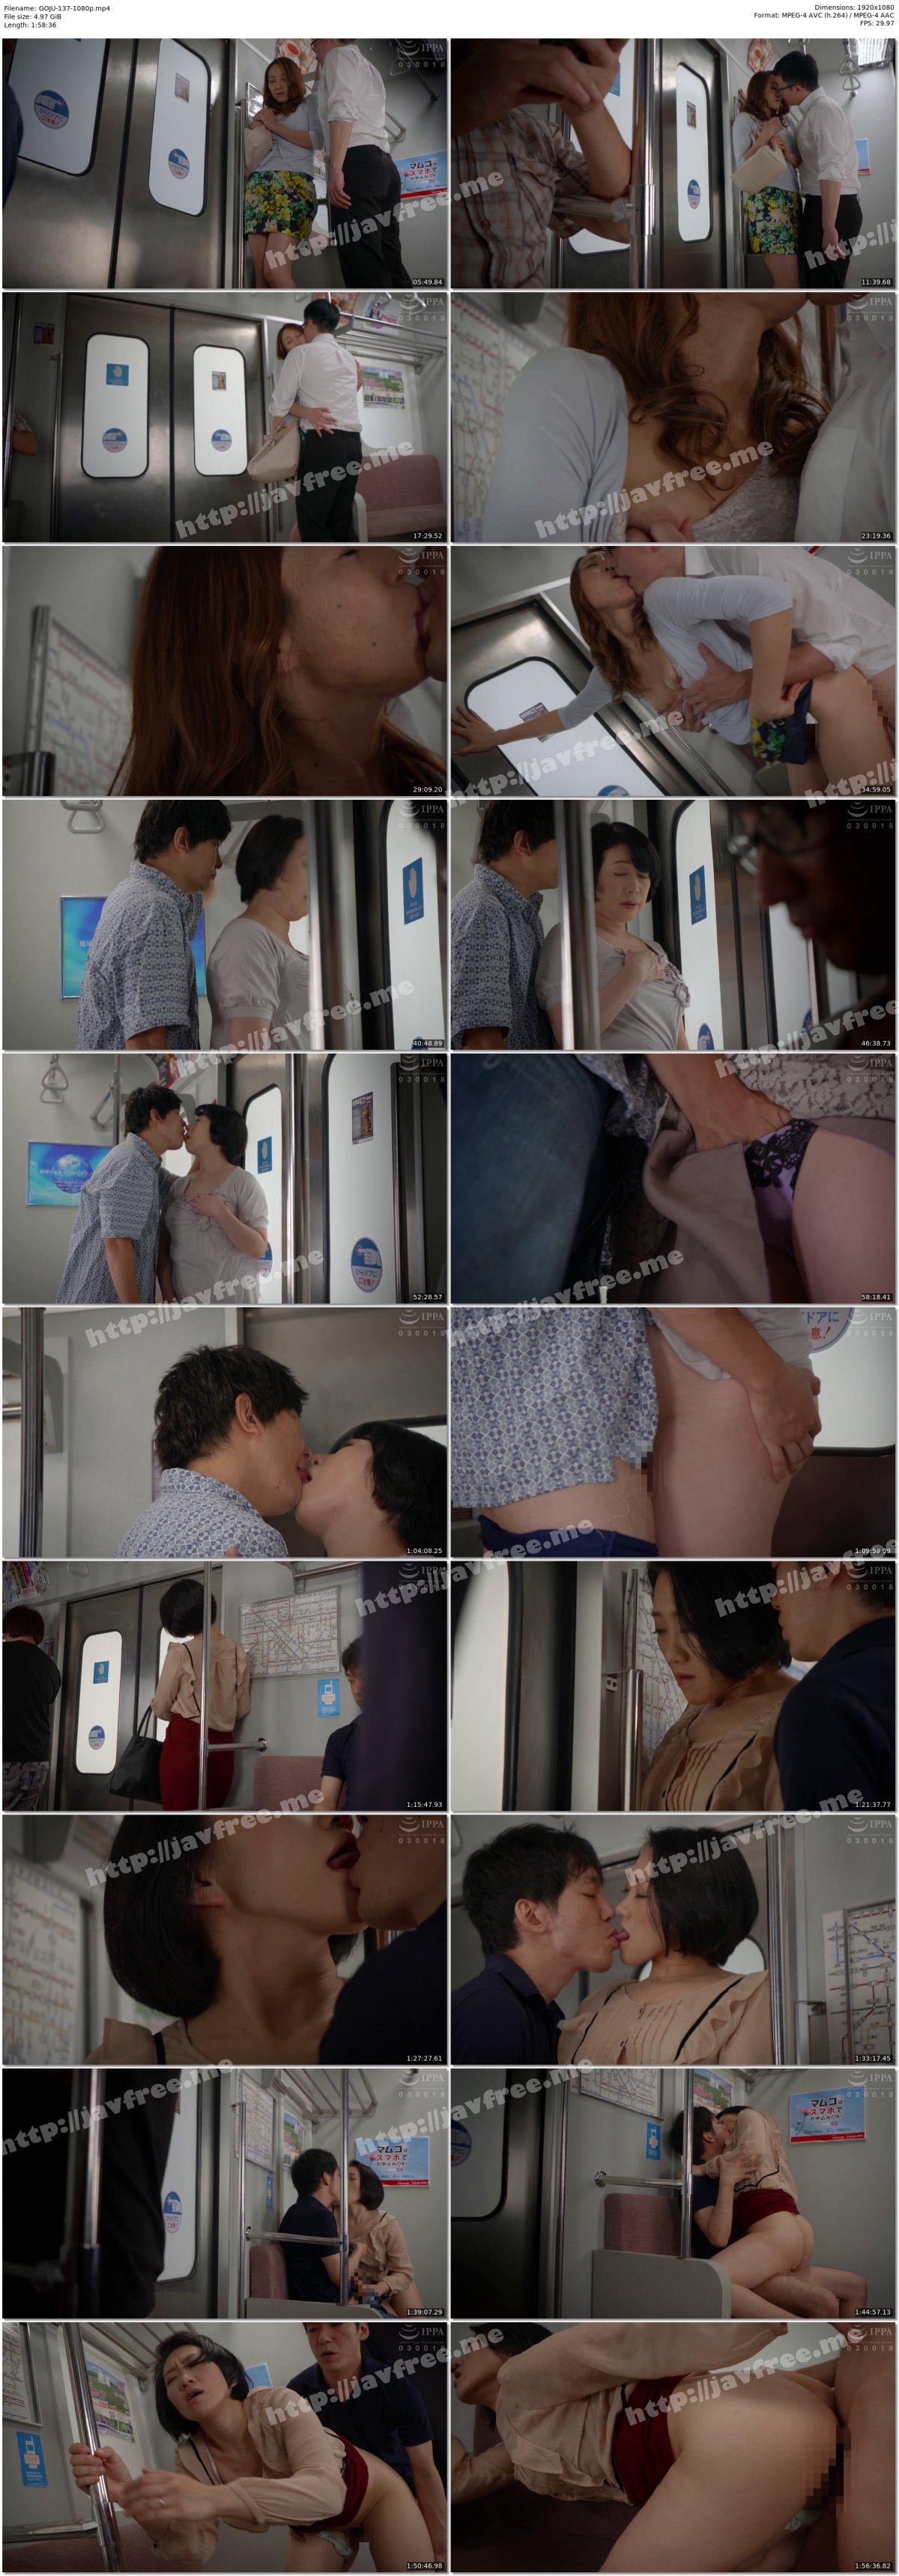 [HD][GOJU-137] 電車痴● 接吻挑発されて発情した熟女たち - image GOJU-137-1080p on https://javfree.me